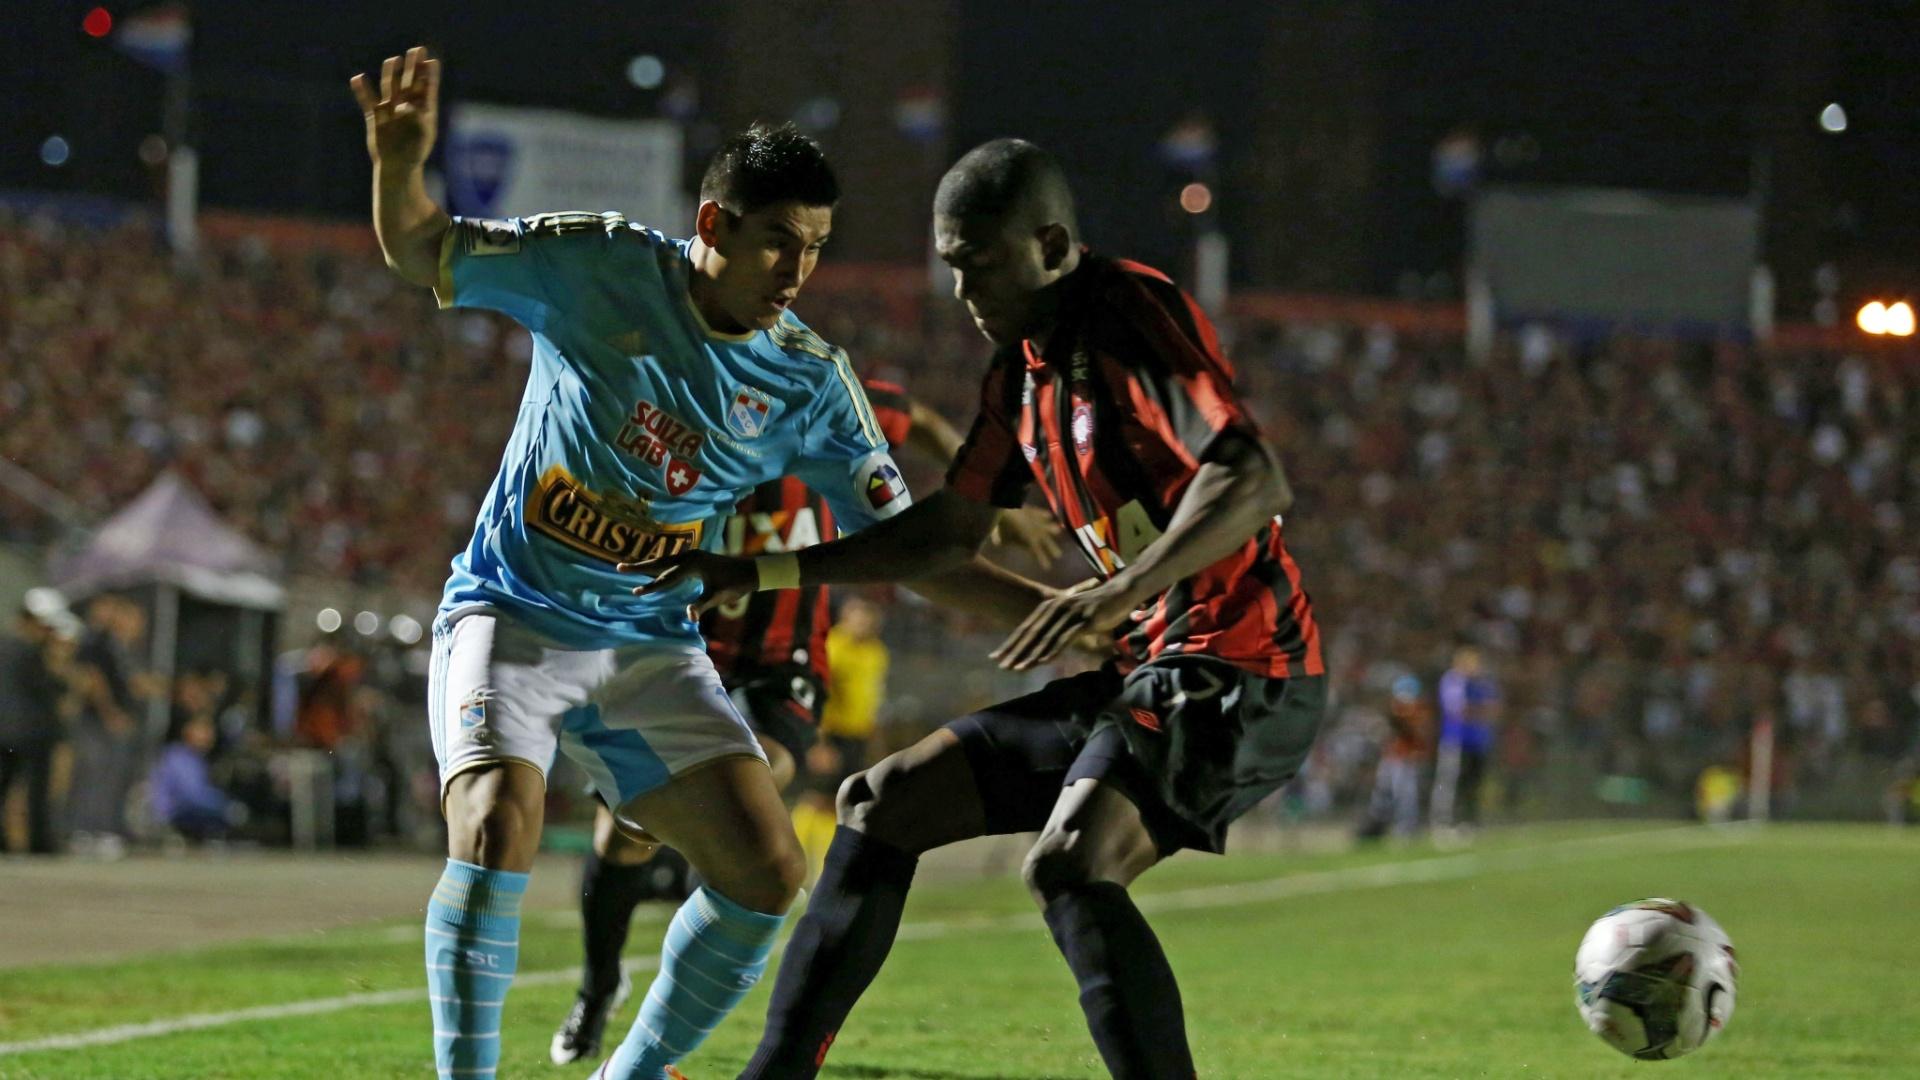 5.fev.2014 - Marcelo tenta roubar a bola de Irven Avila durante partida entre Atlético-PR e Sporting Cristal